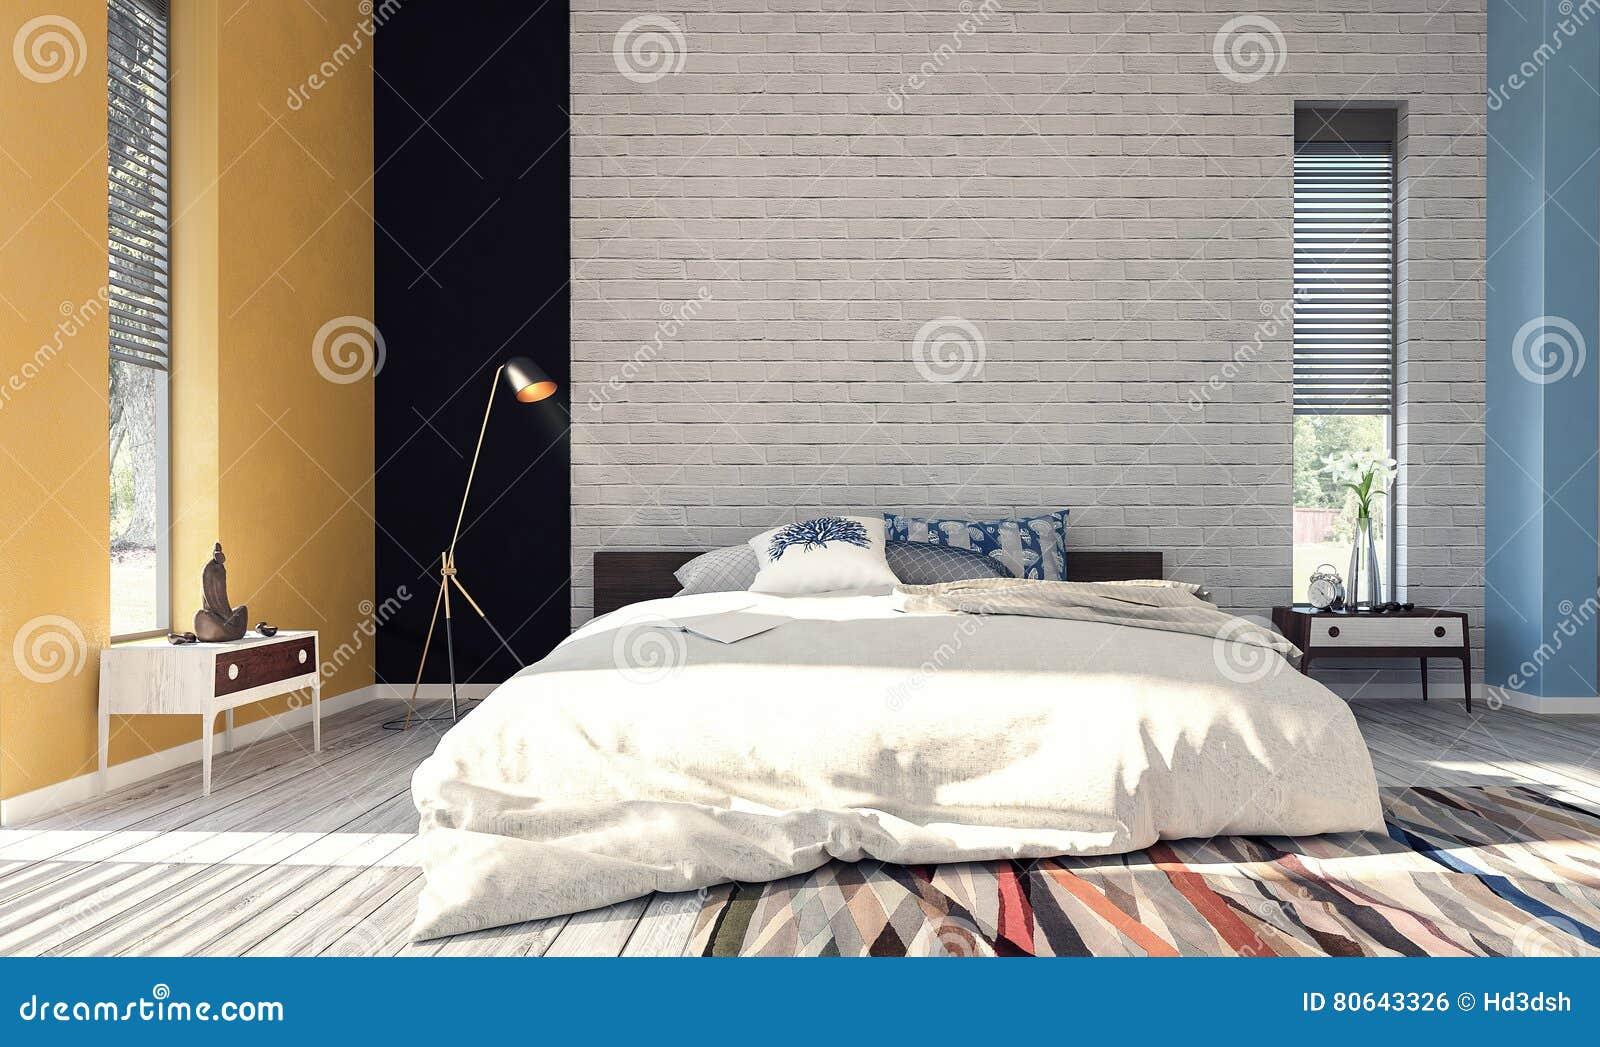 Moderne Slaapkamer Ontwerpen : Modern ontwerp van slaapkamer stock foto afbeelding bestaande